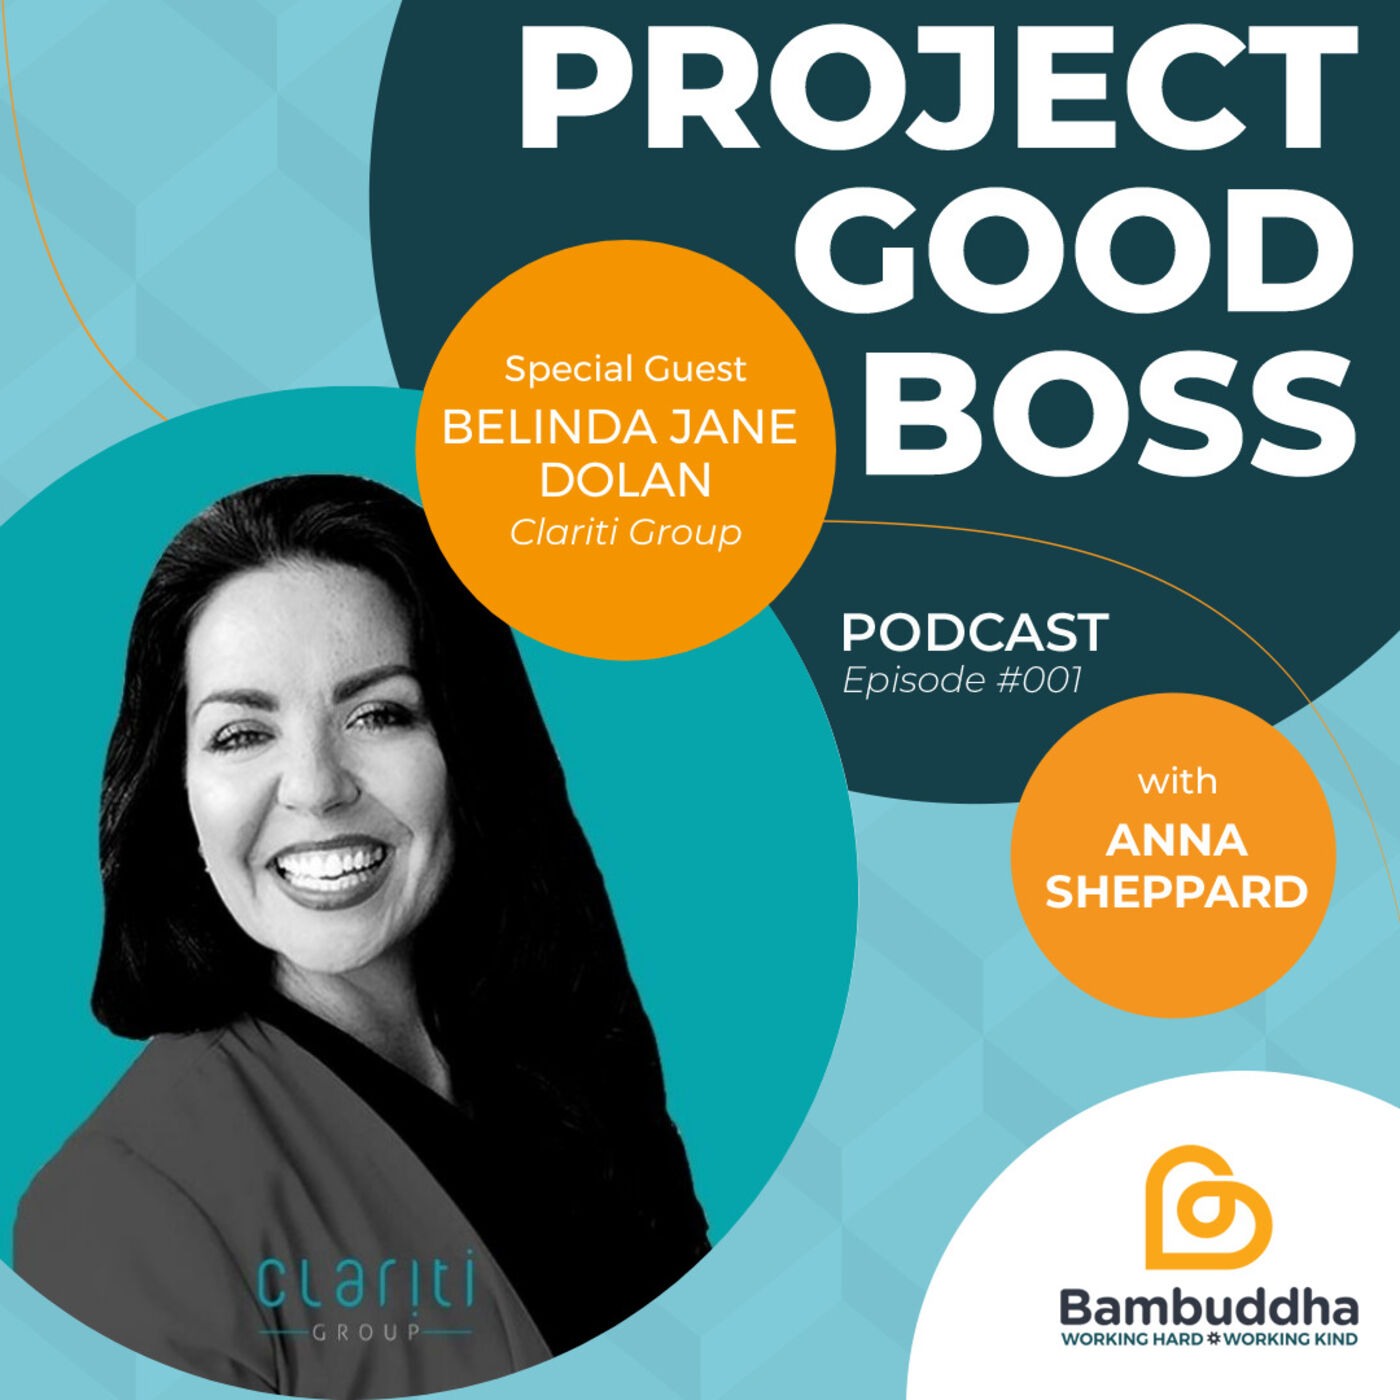 Belinda Jane Dolan on Happiness and Peak Performance